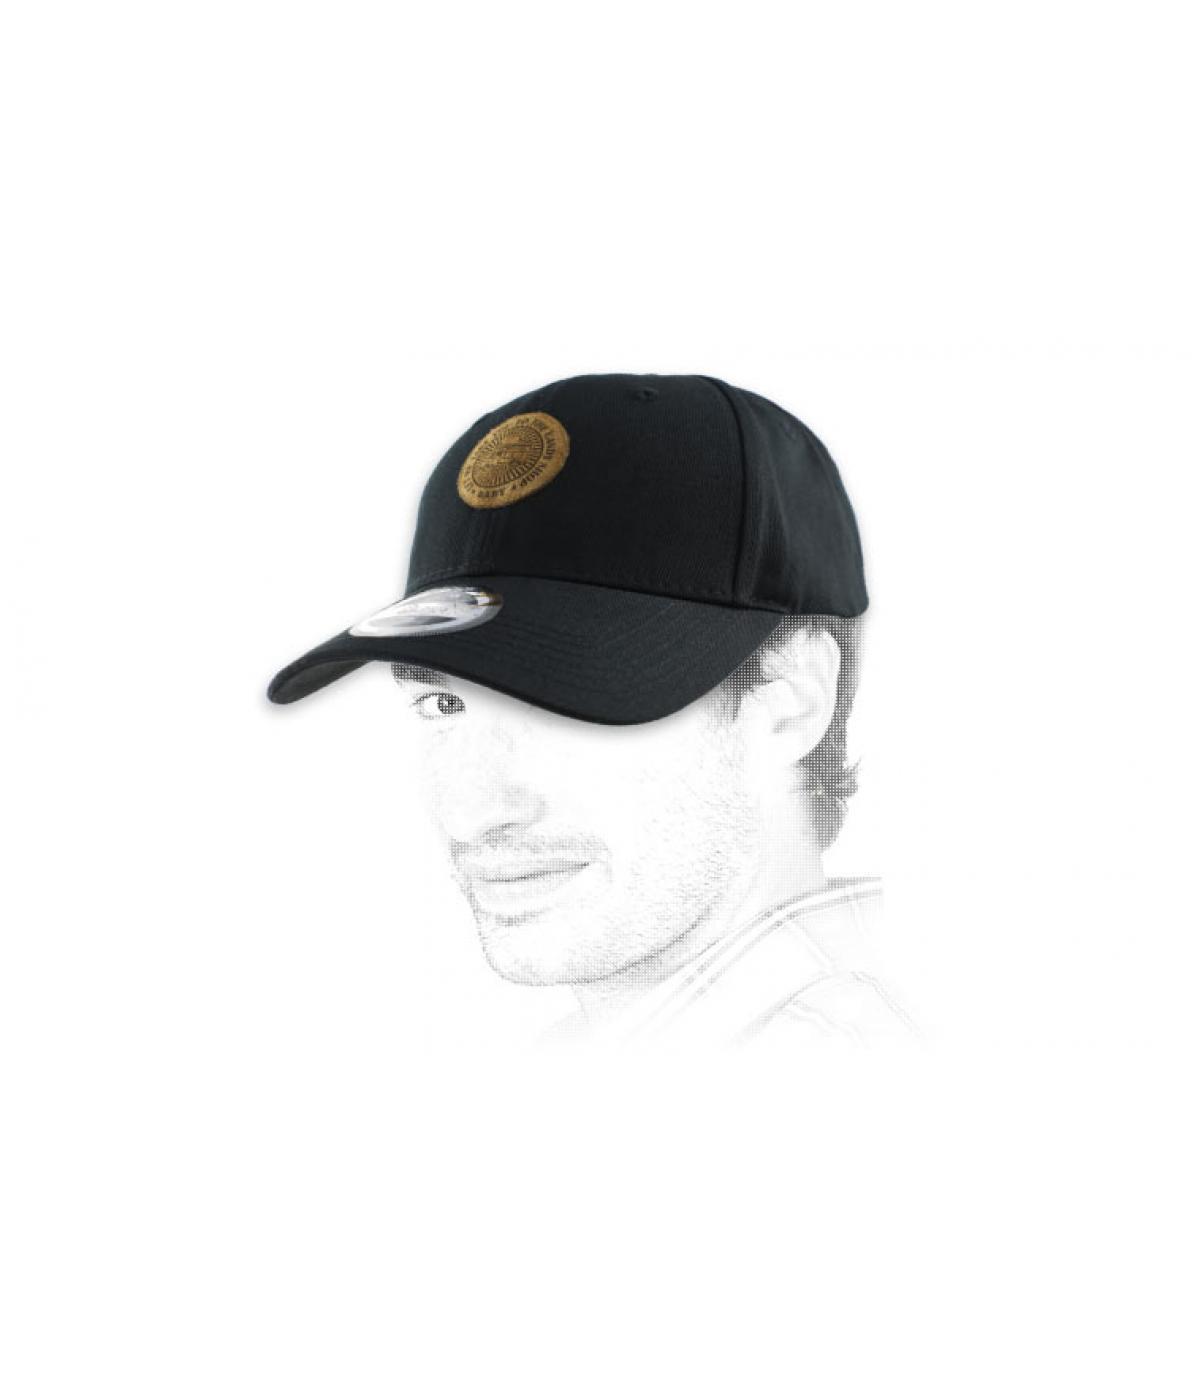 black Candy Shop cap